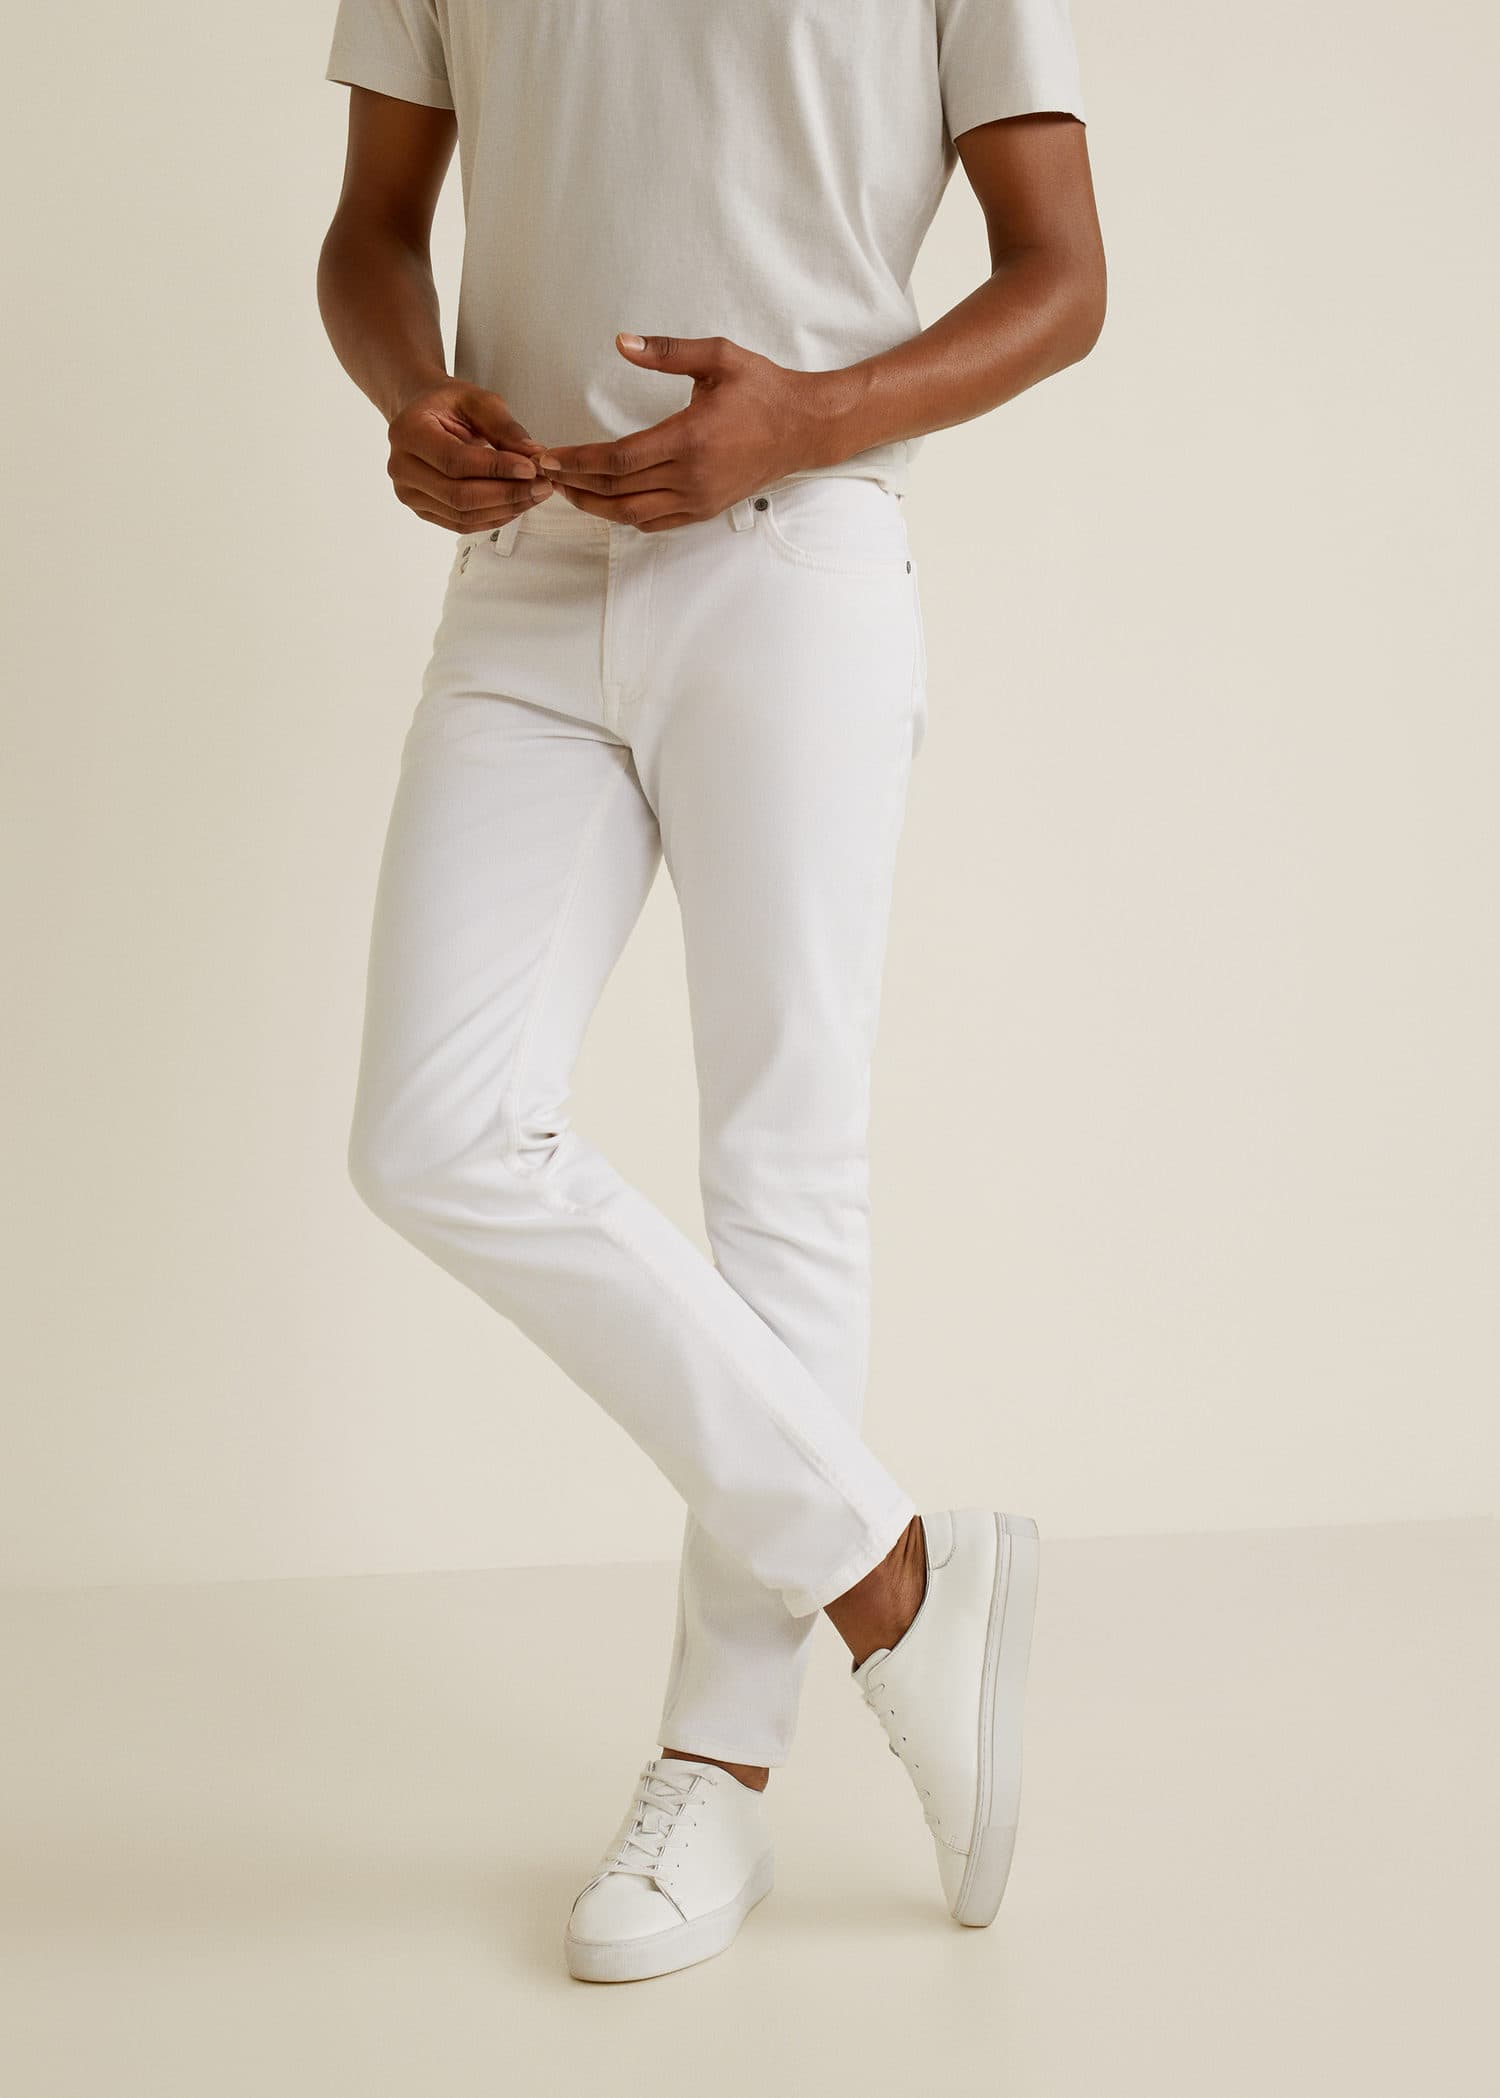 Jeans jan slim fit blancos Hombre | Pantalón blanco